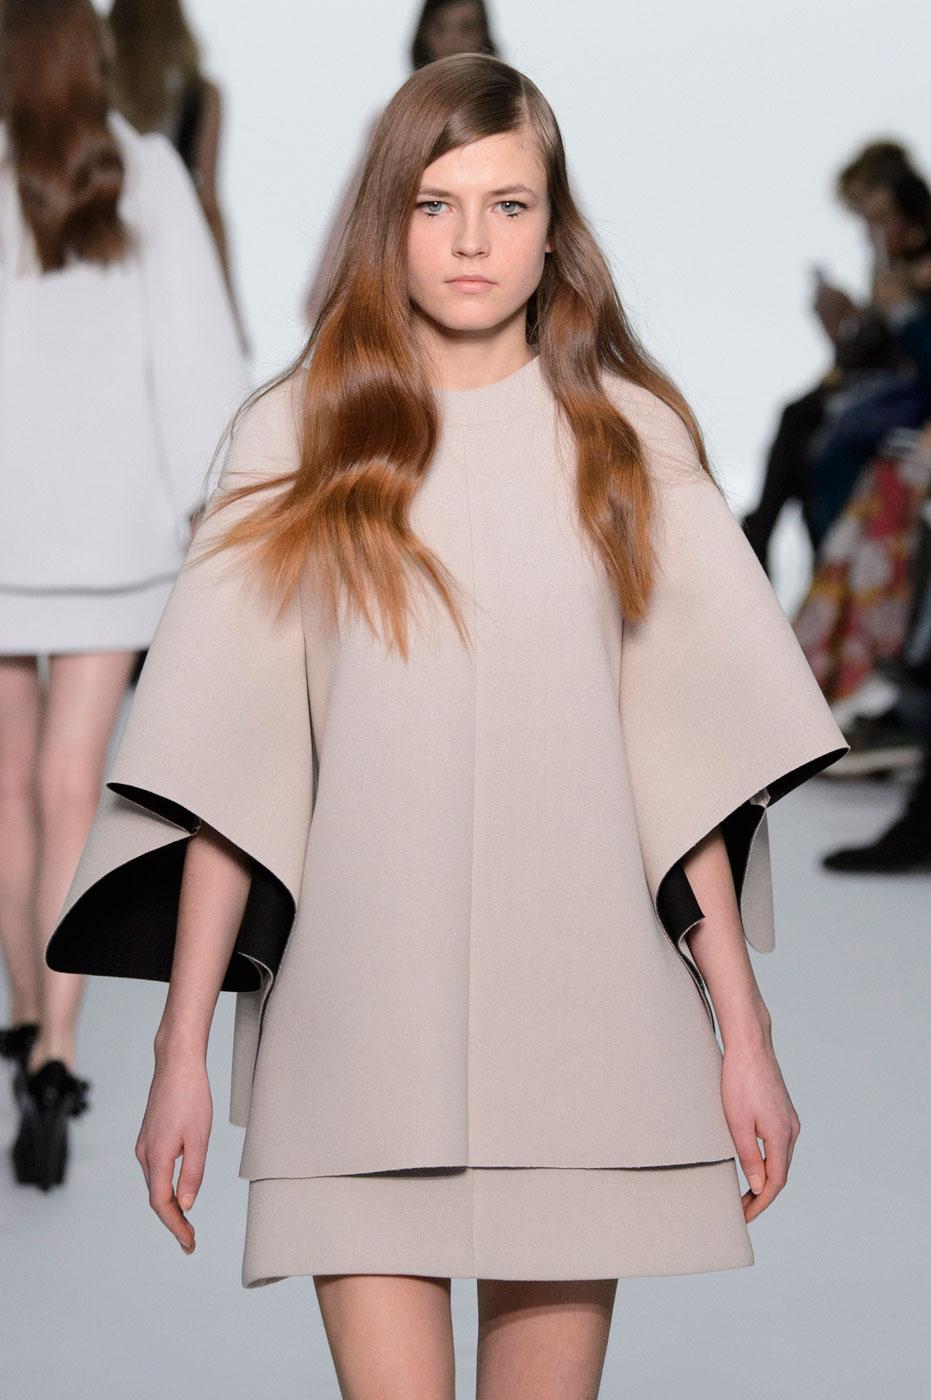 Kayek-fashion-runway-show-haute-couture-paris-spring-summer-2015-the-impression-20